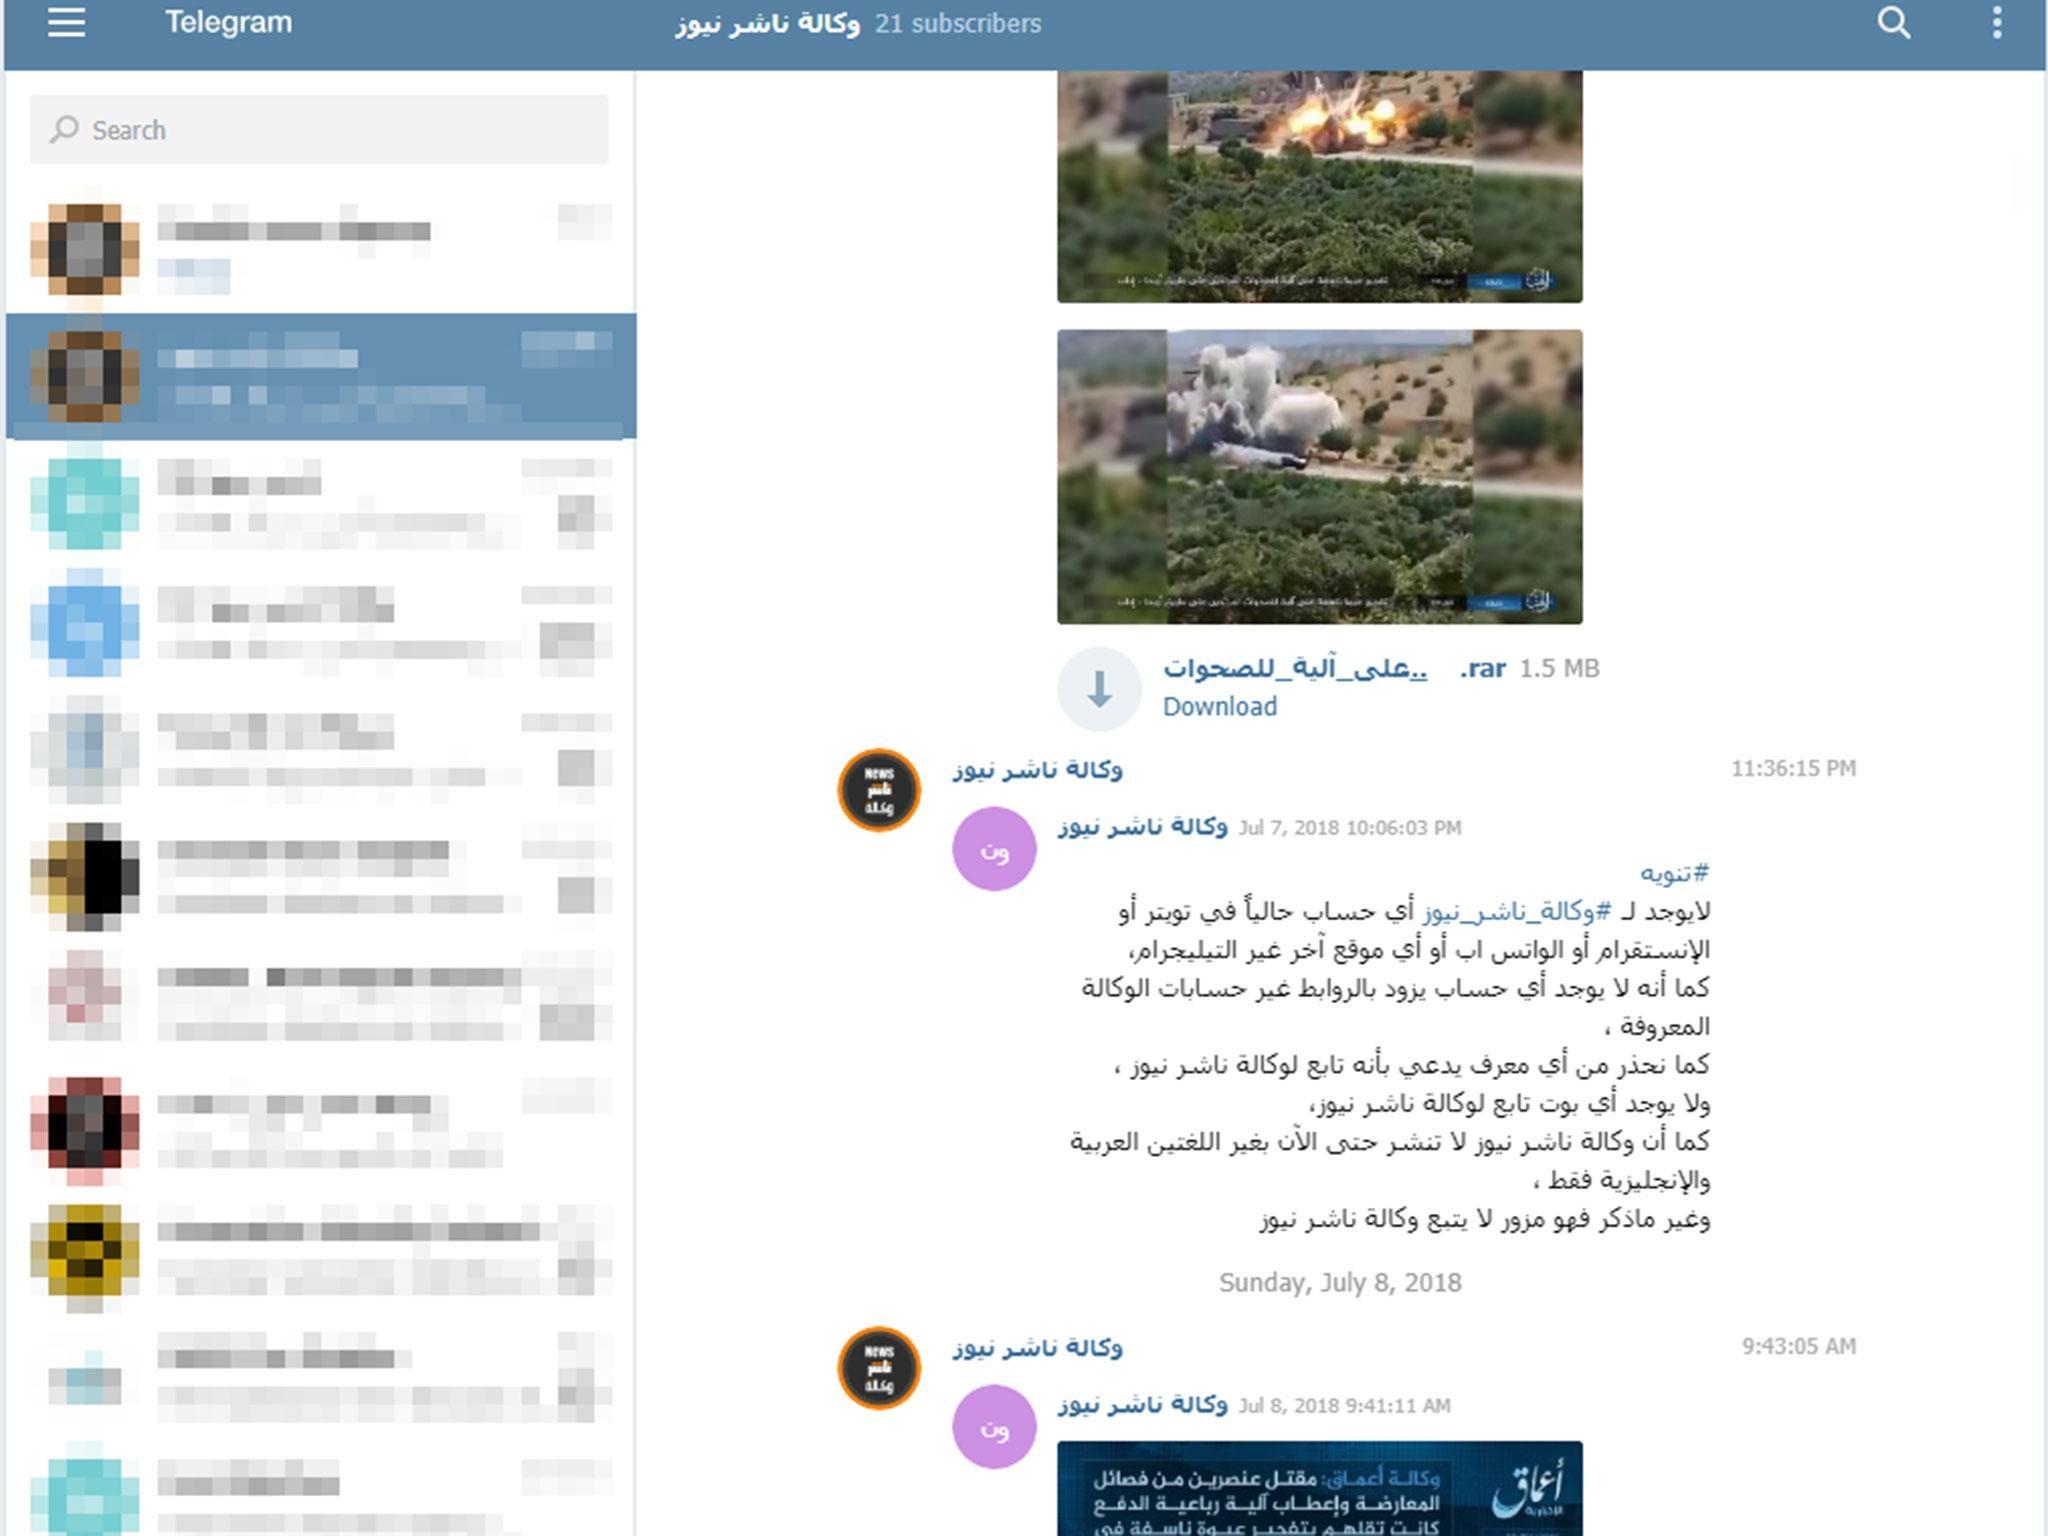 Deep Web Telegram Links